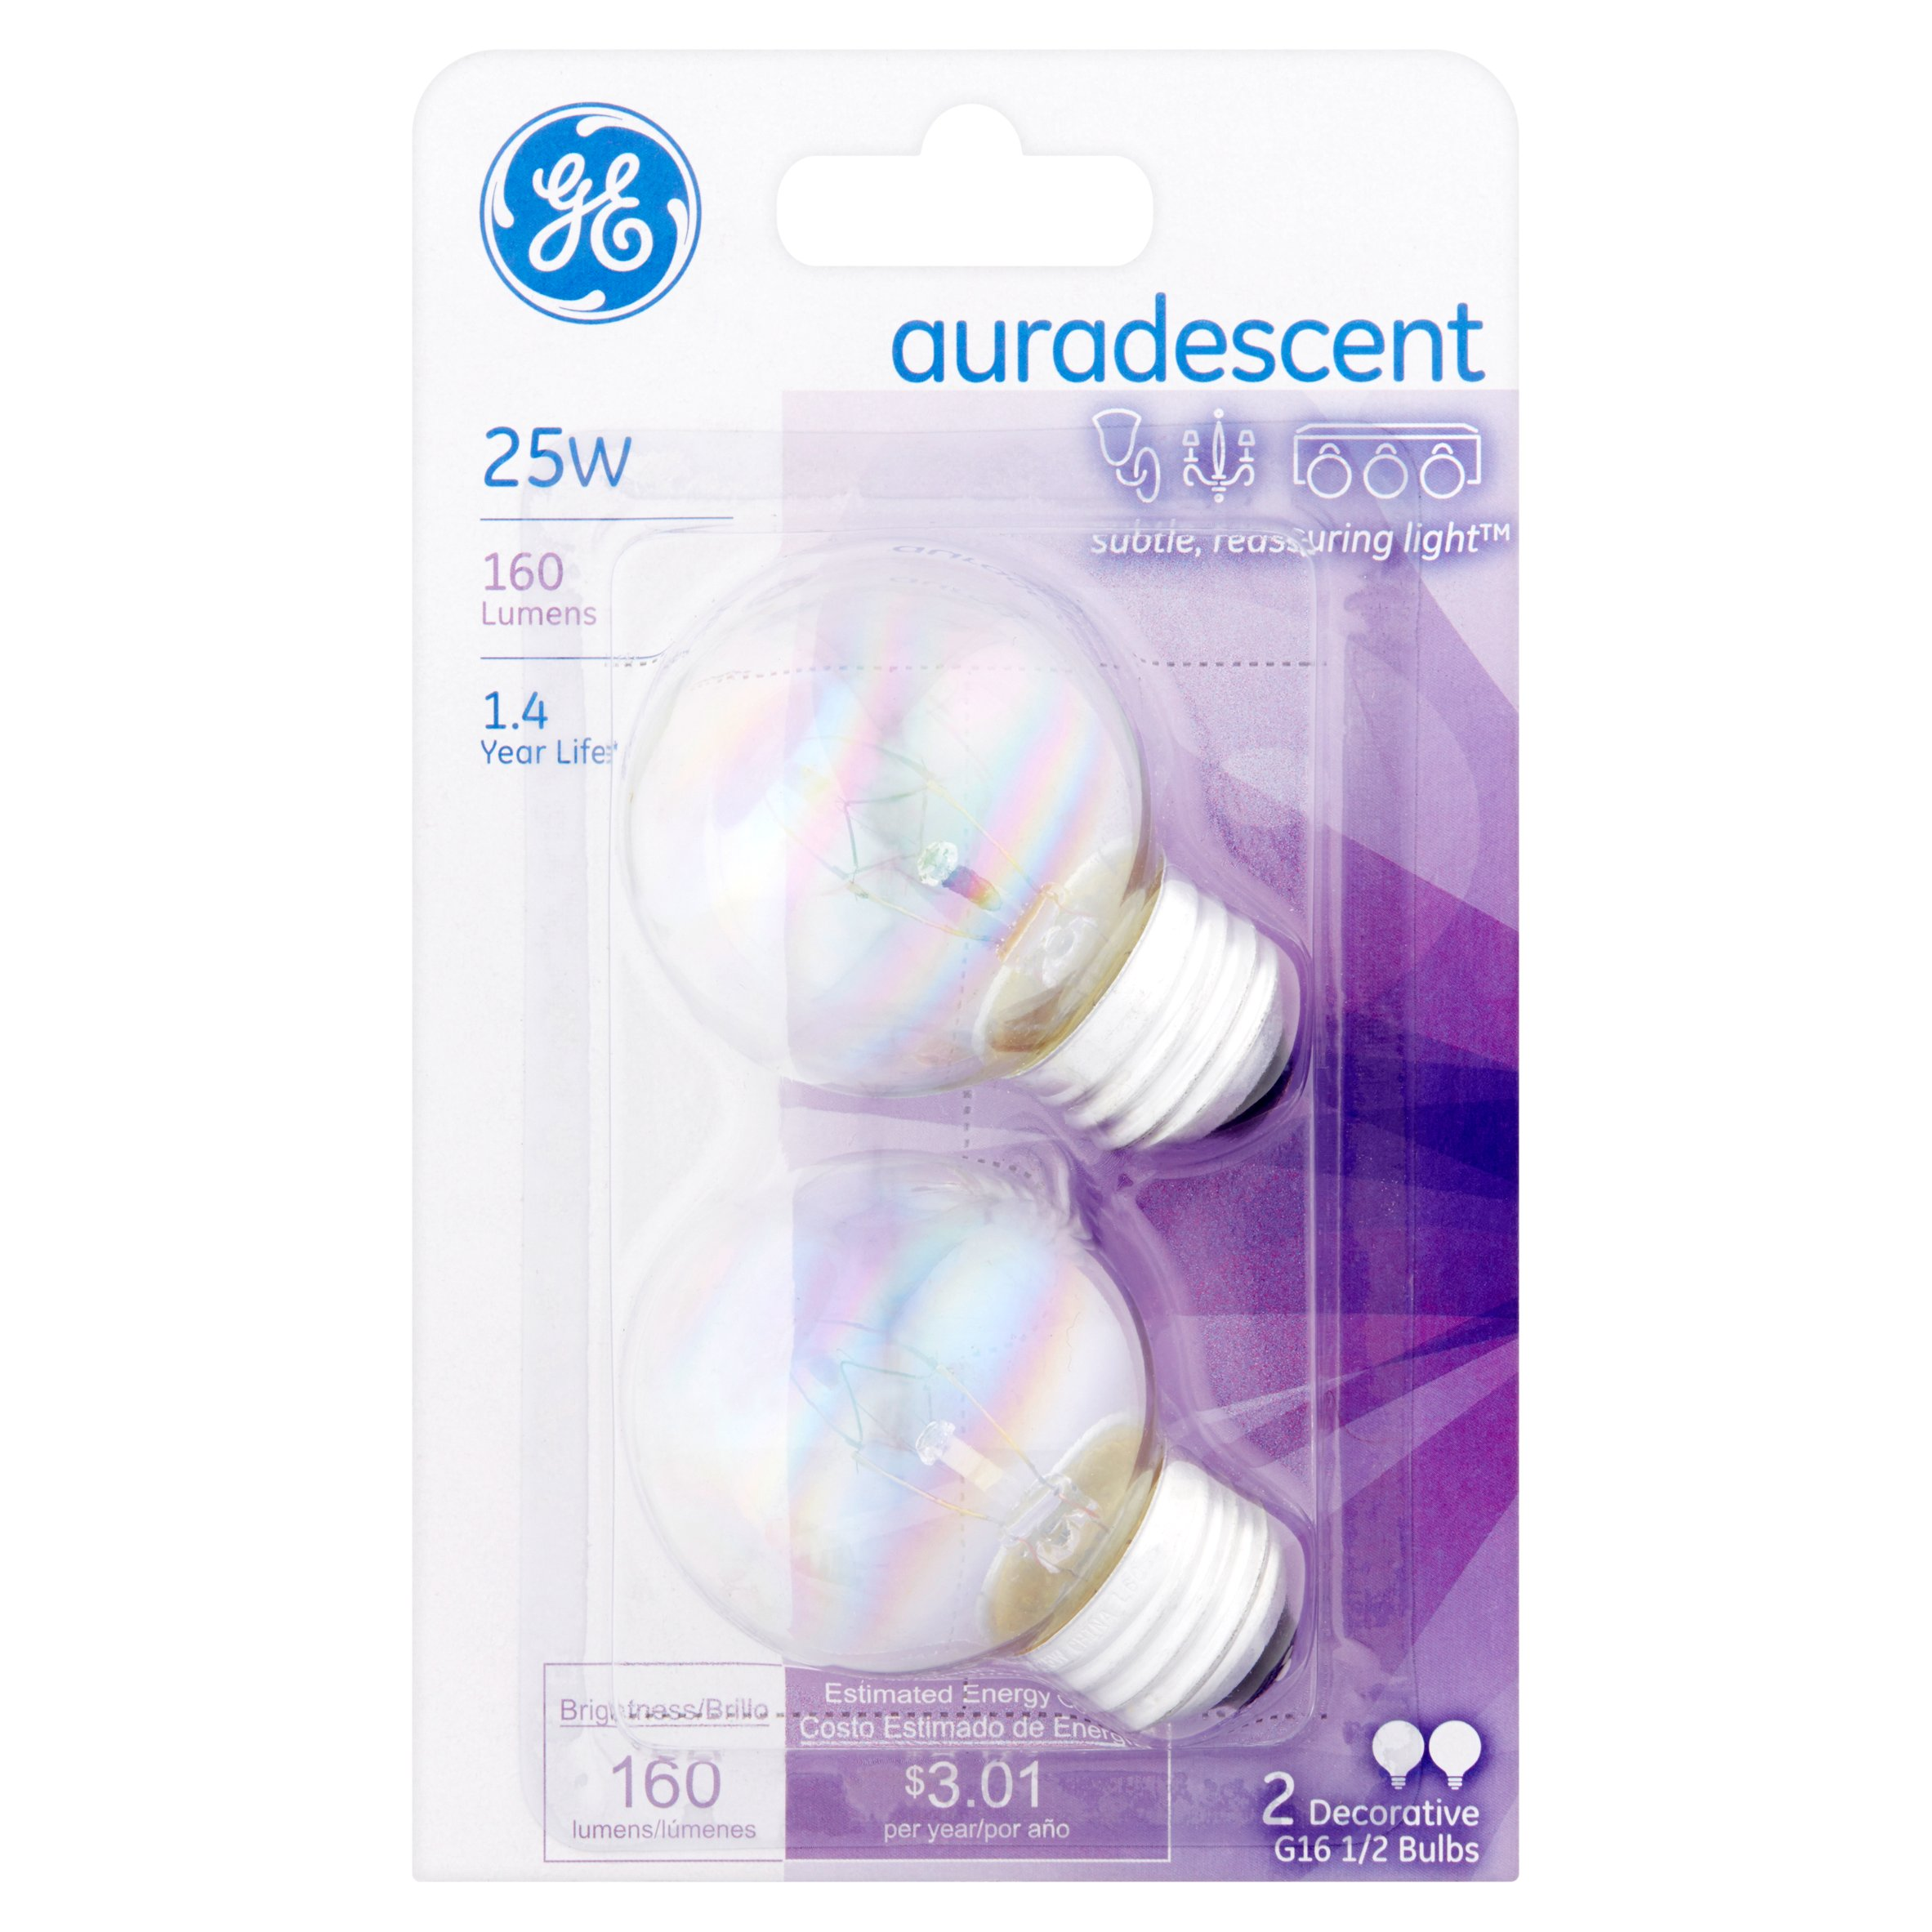 GE Auradescent 25W Decorative G16 1/2 Bulbs, 2 count